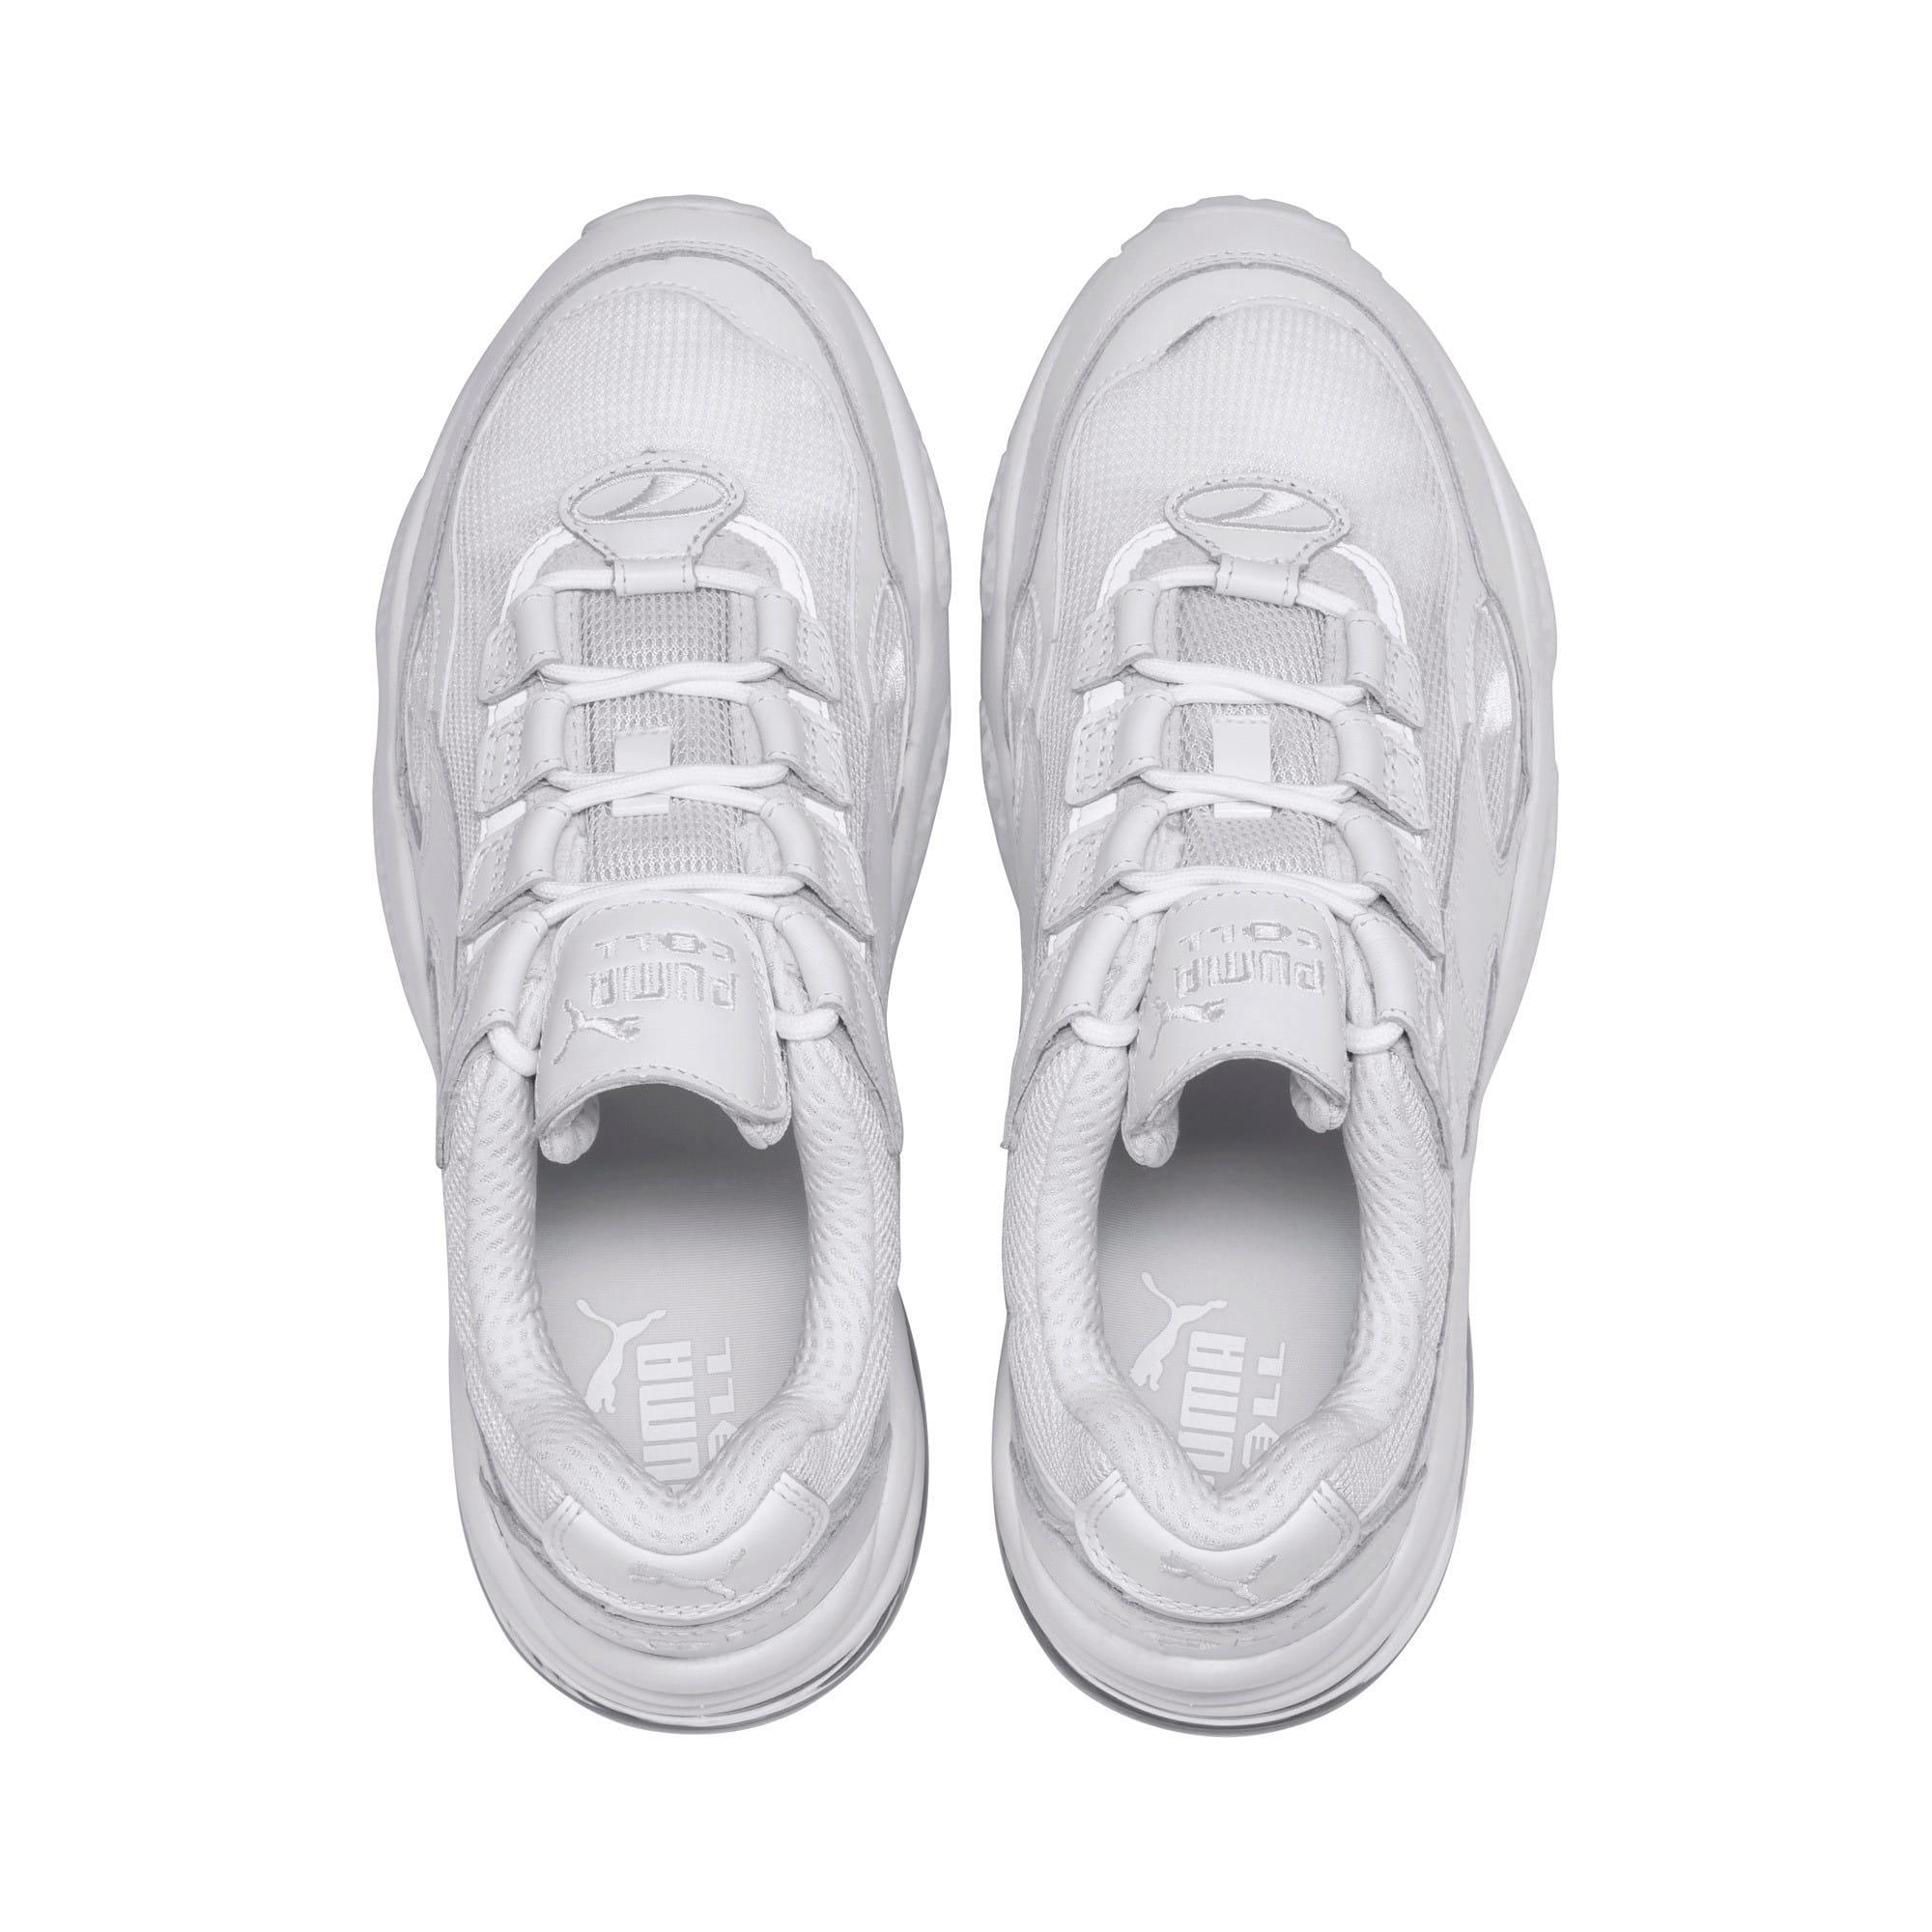 Thumbnail 7 of CELL Venom Reflective Sneakers, Puma White-Puma White, medium